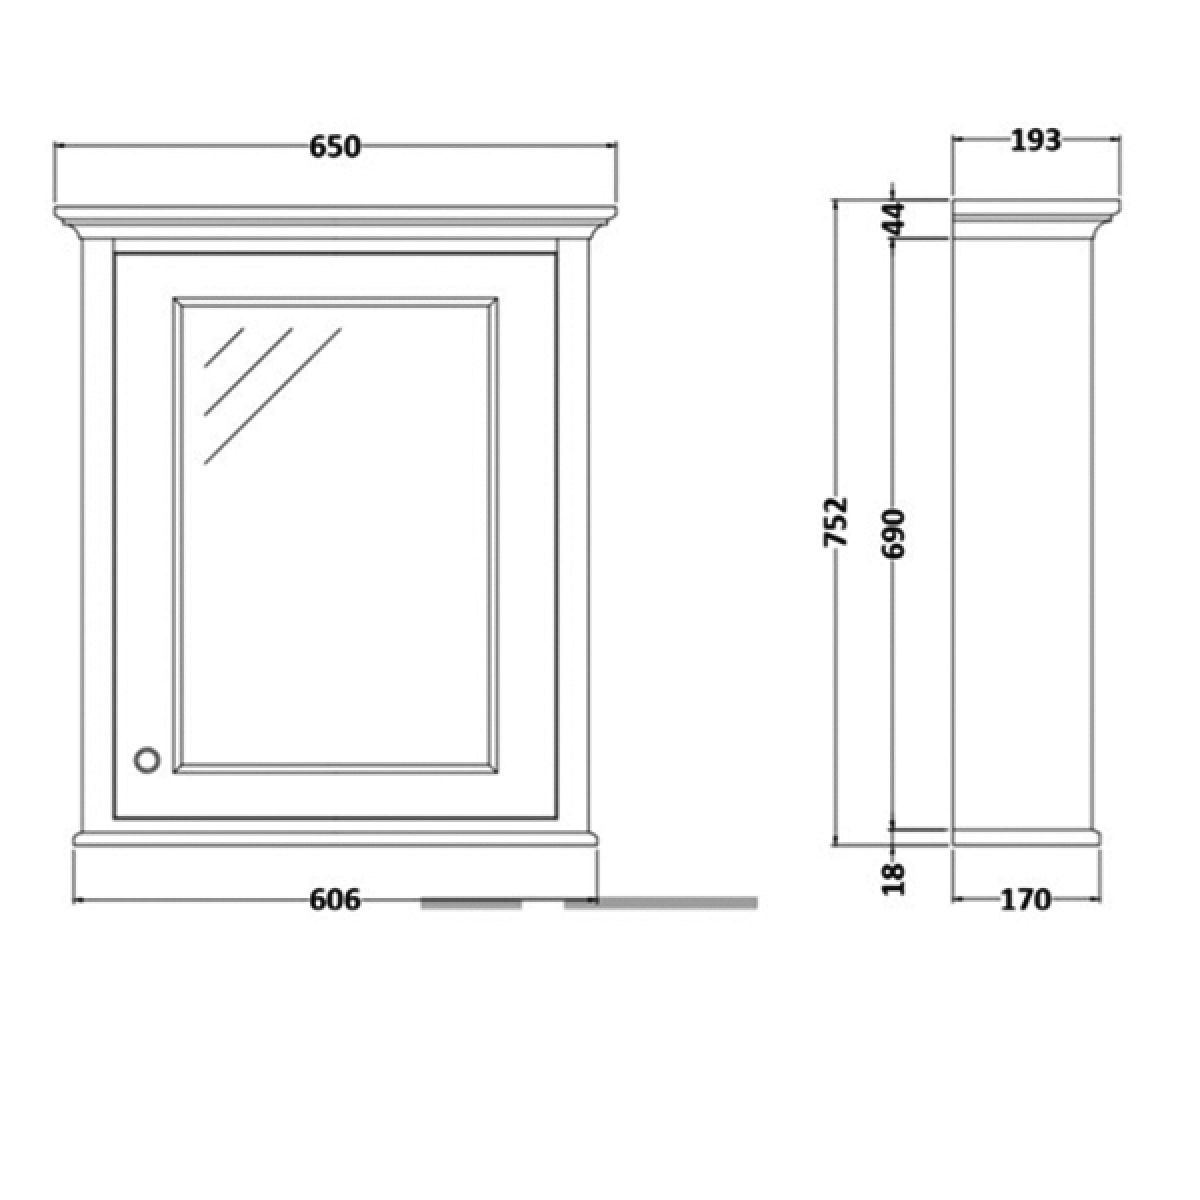 RAK Washington Cappucino Bathroom Mirror Cabinet 650mm Measurements